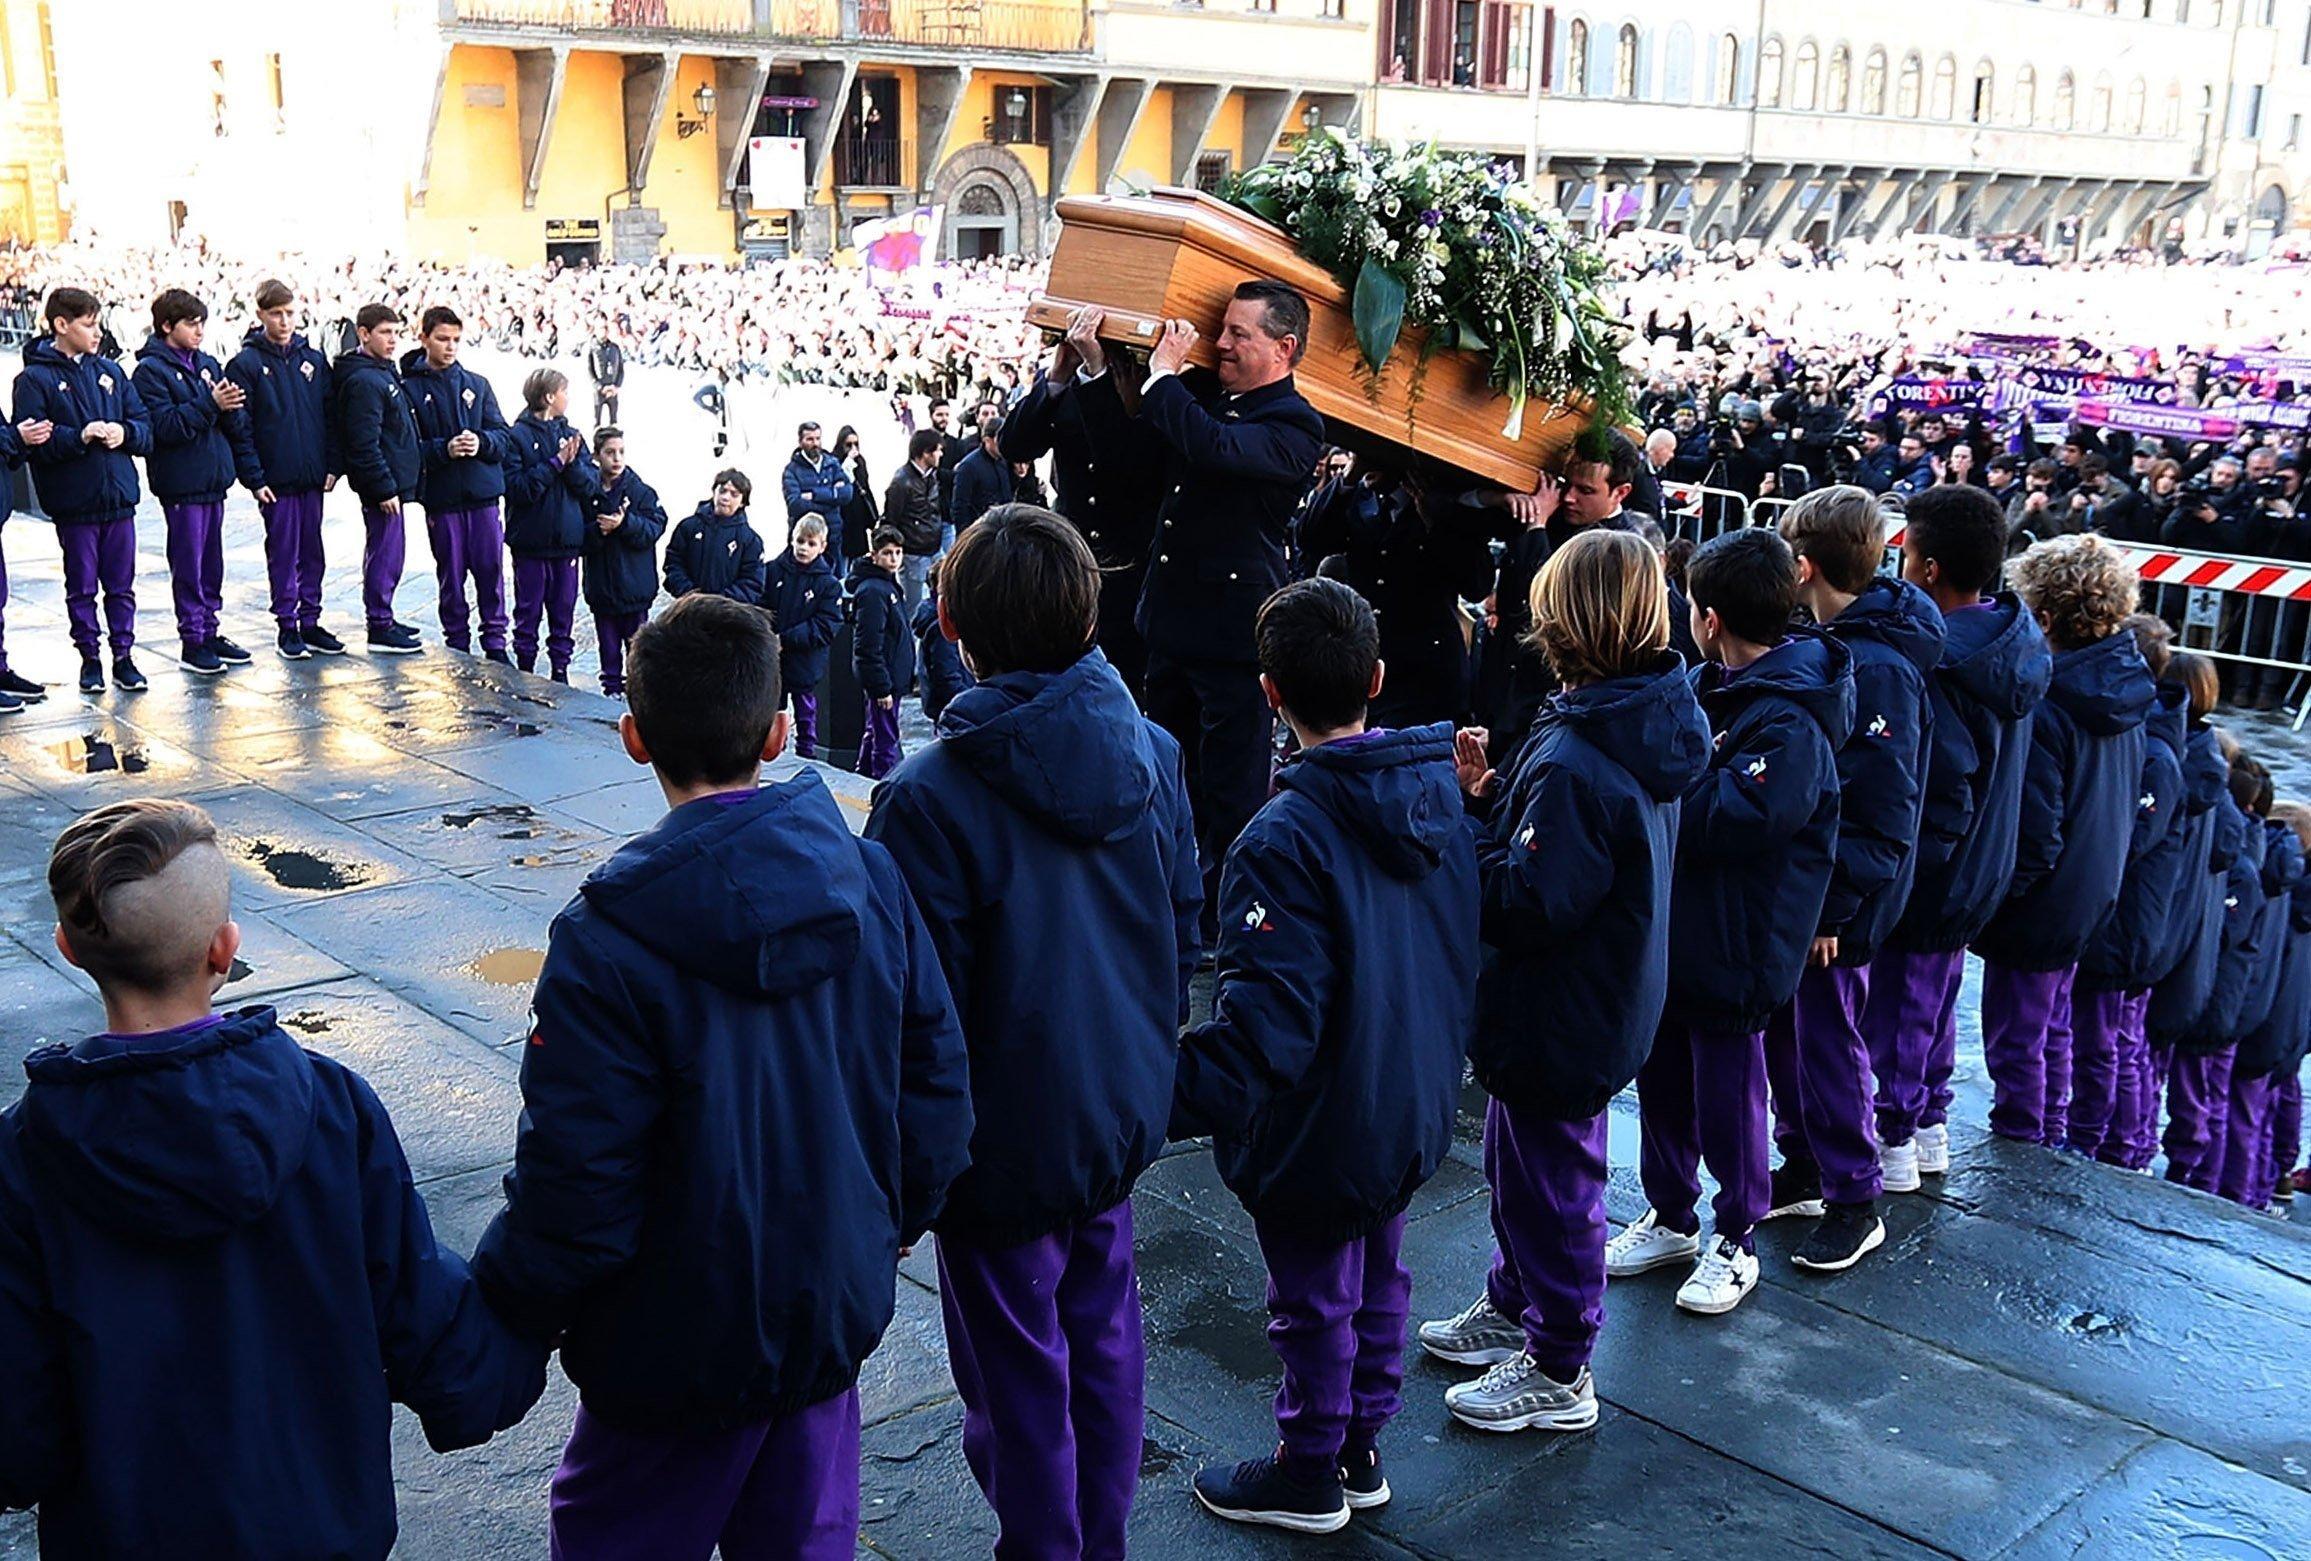 The coffin of Fiorentina captain Davide Astori is carried into the Basilica di Santa Croce Thursday, March 8, 2018.